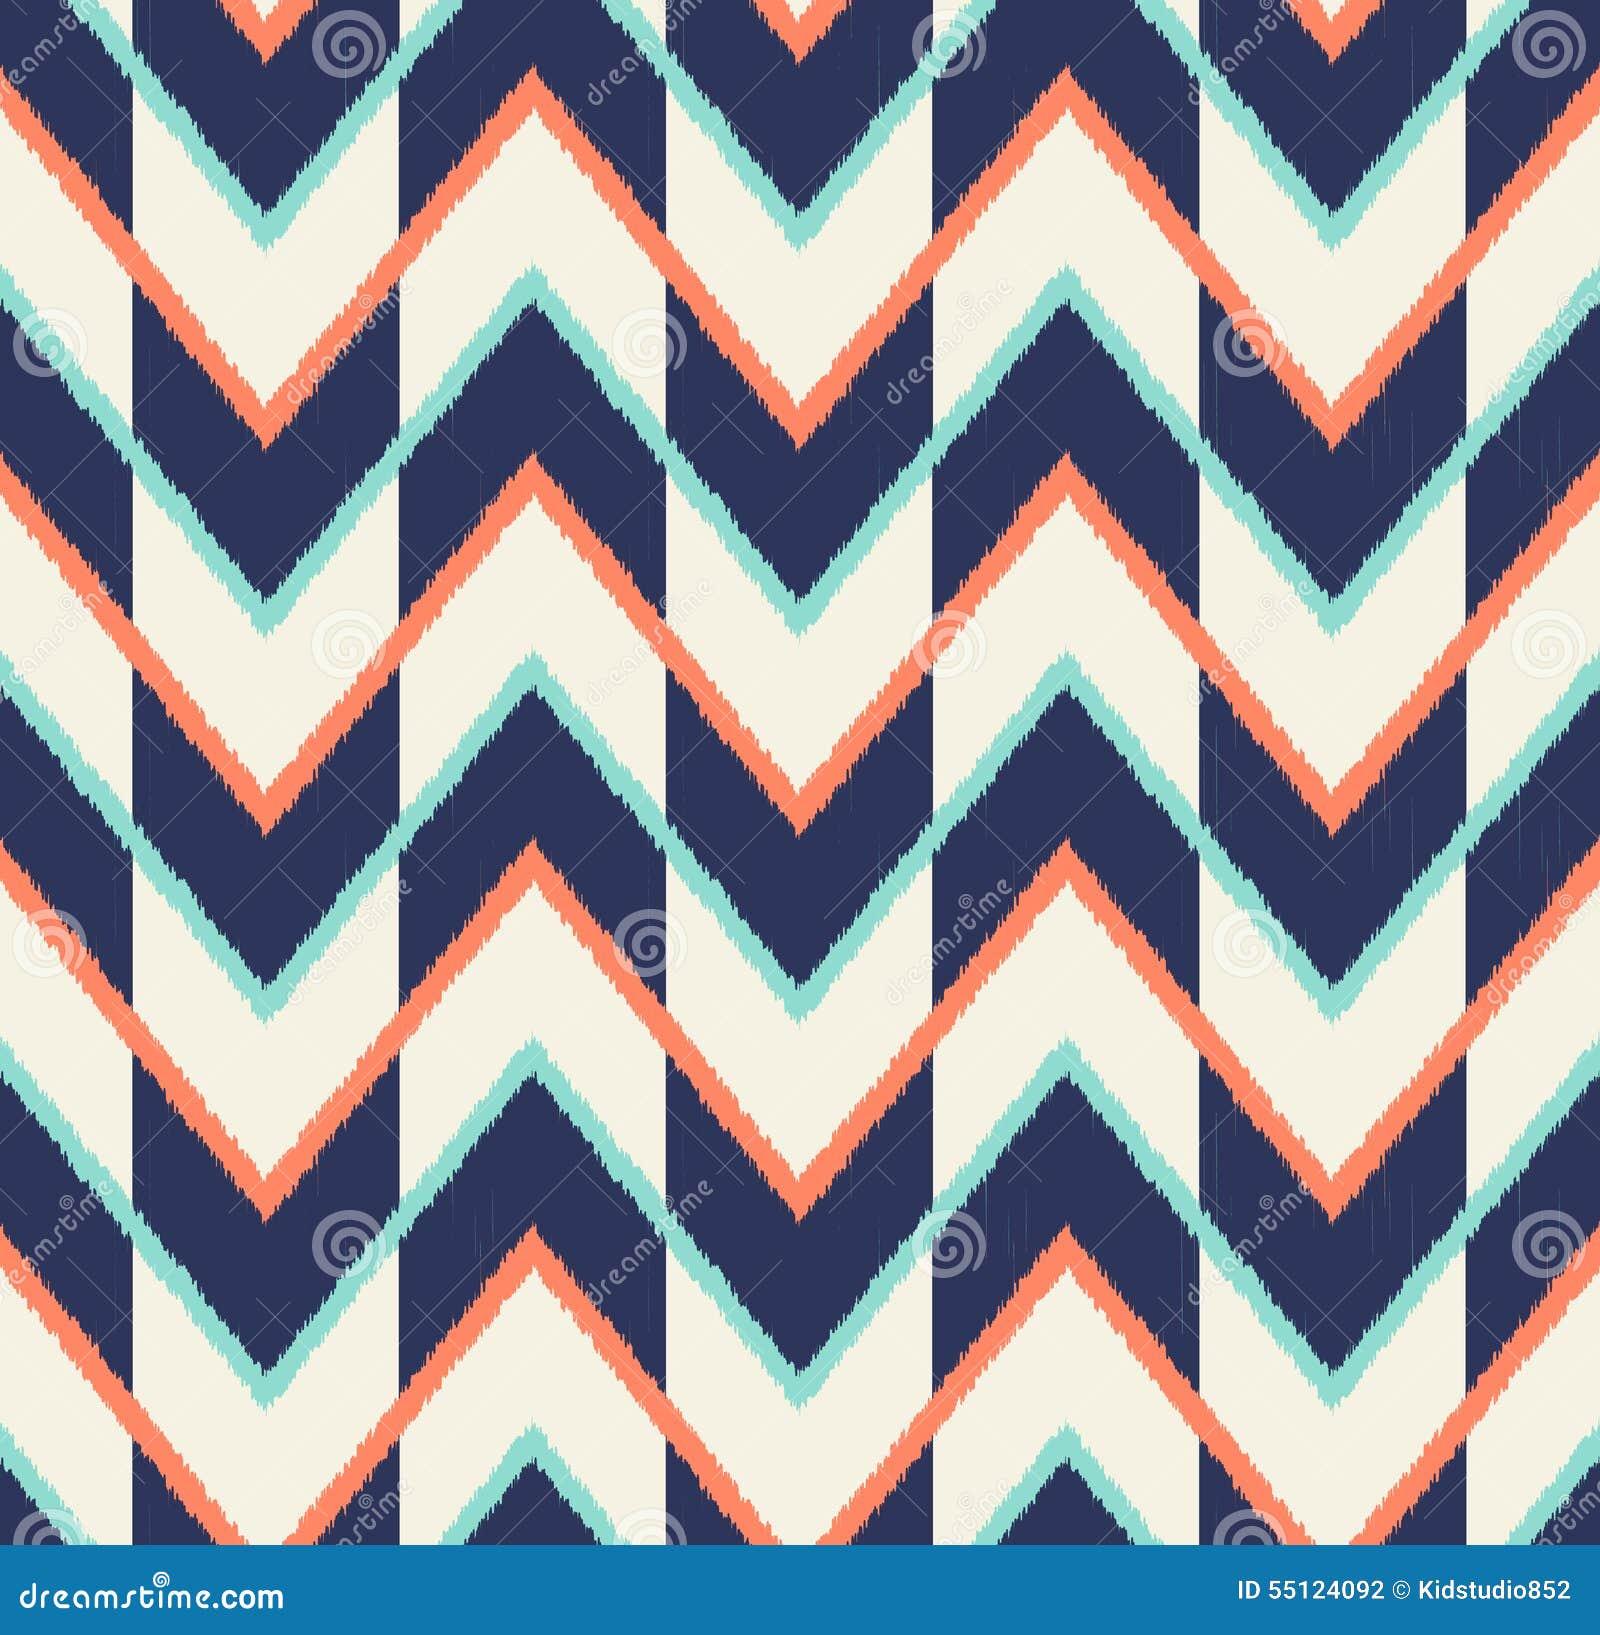 Seamless multicolor arrow pattern